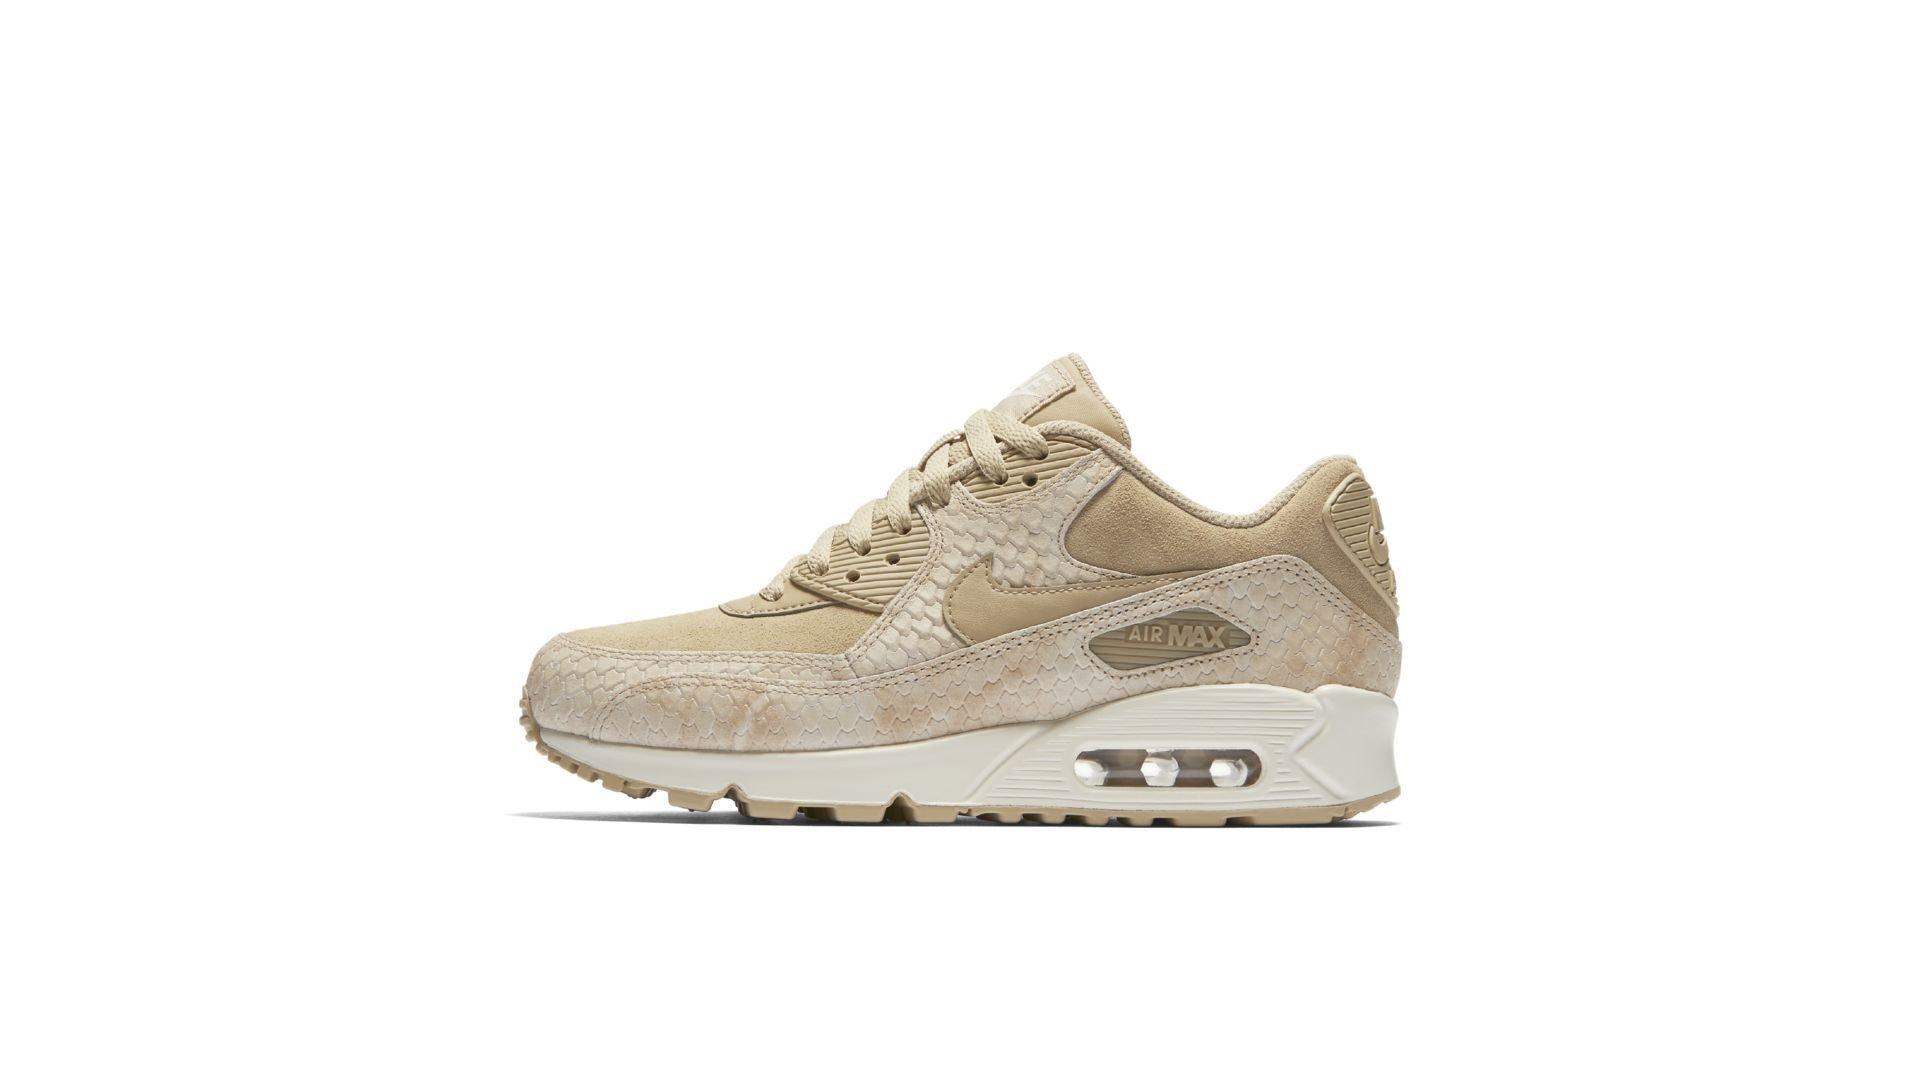 Nike Air Max 90 Premium Linen (896497-200)